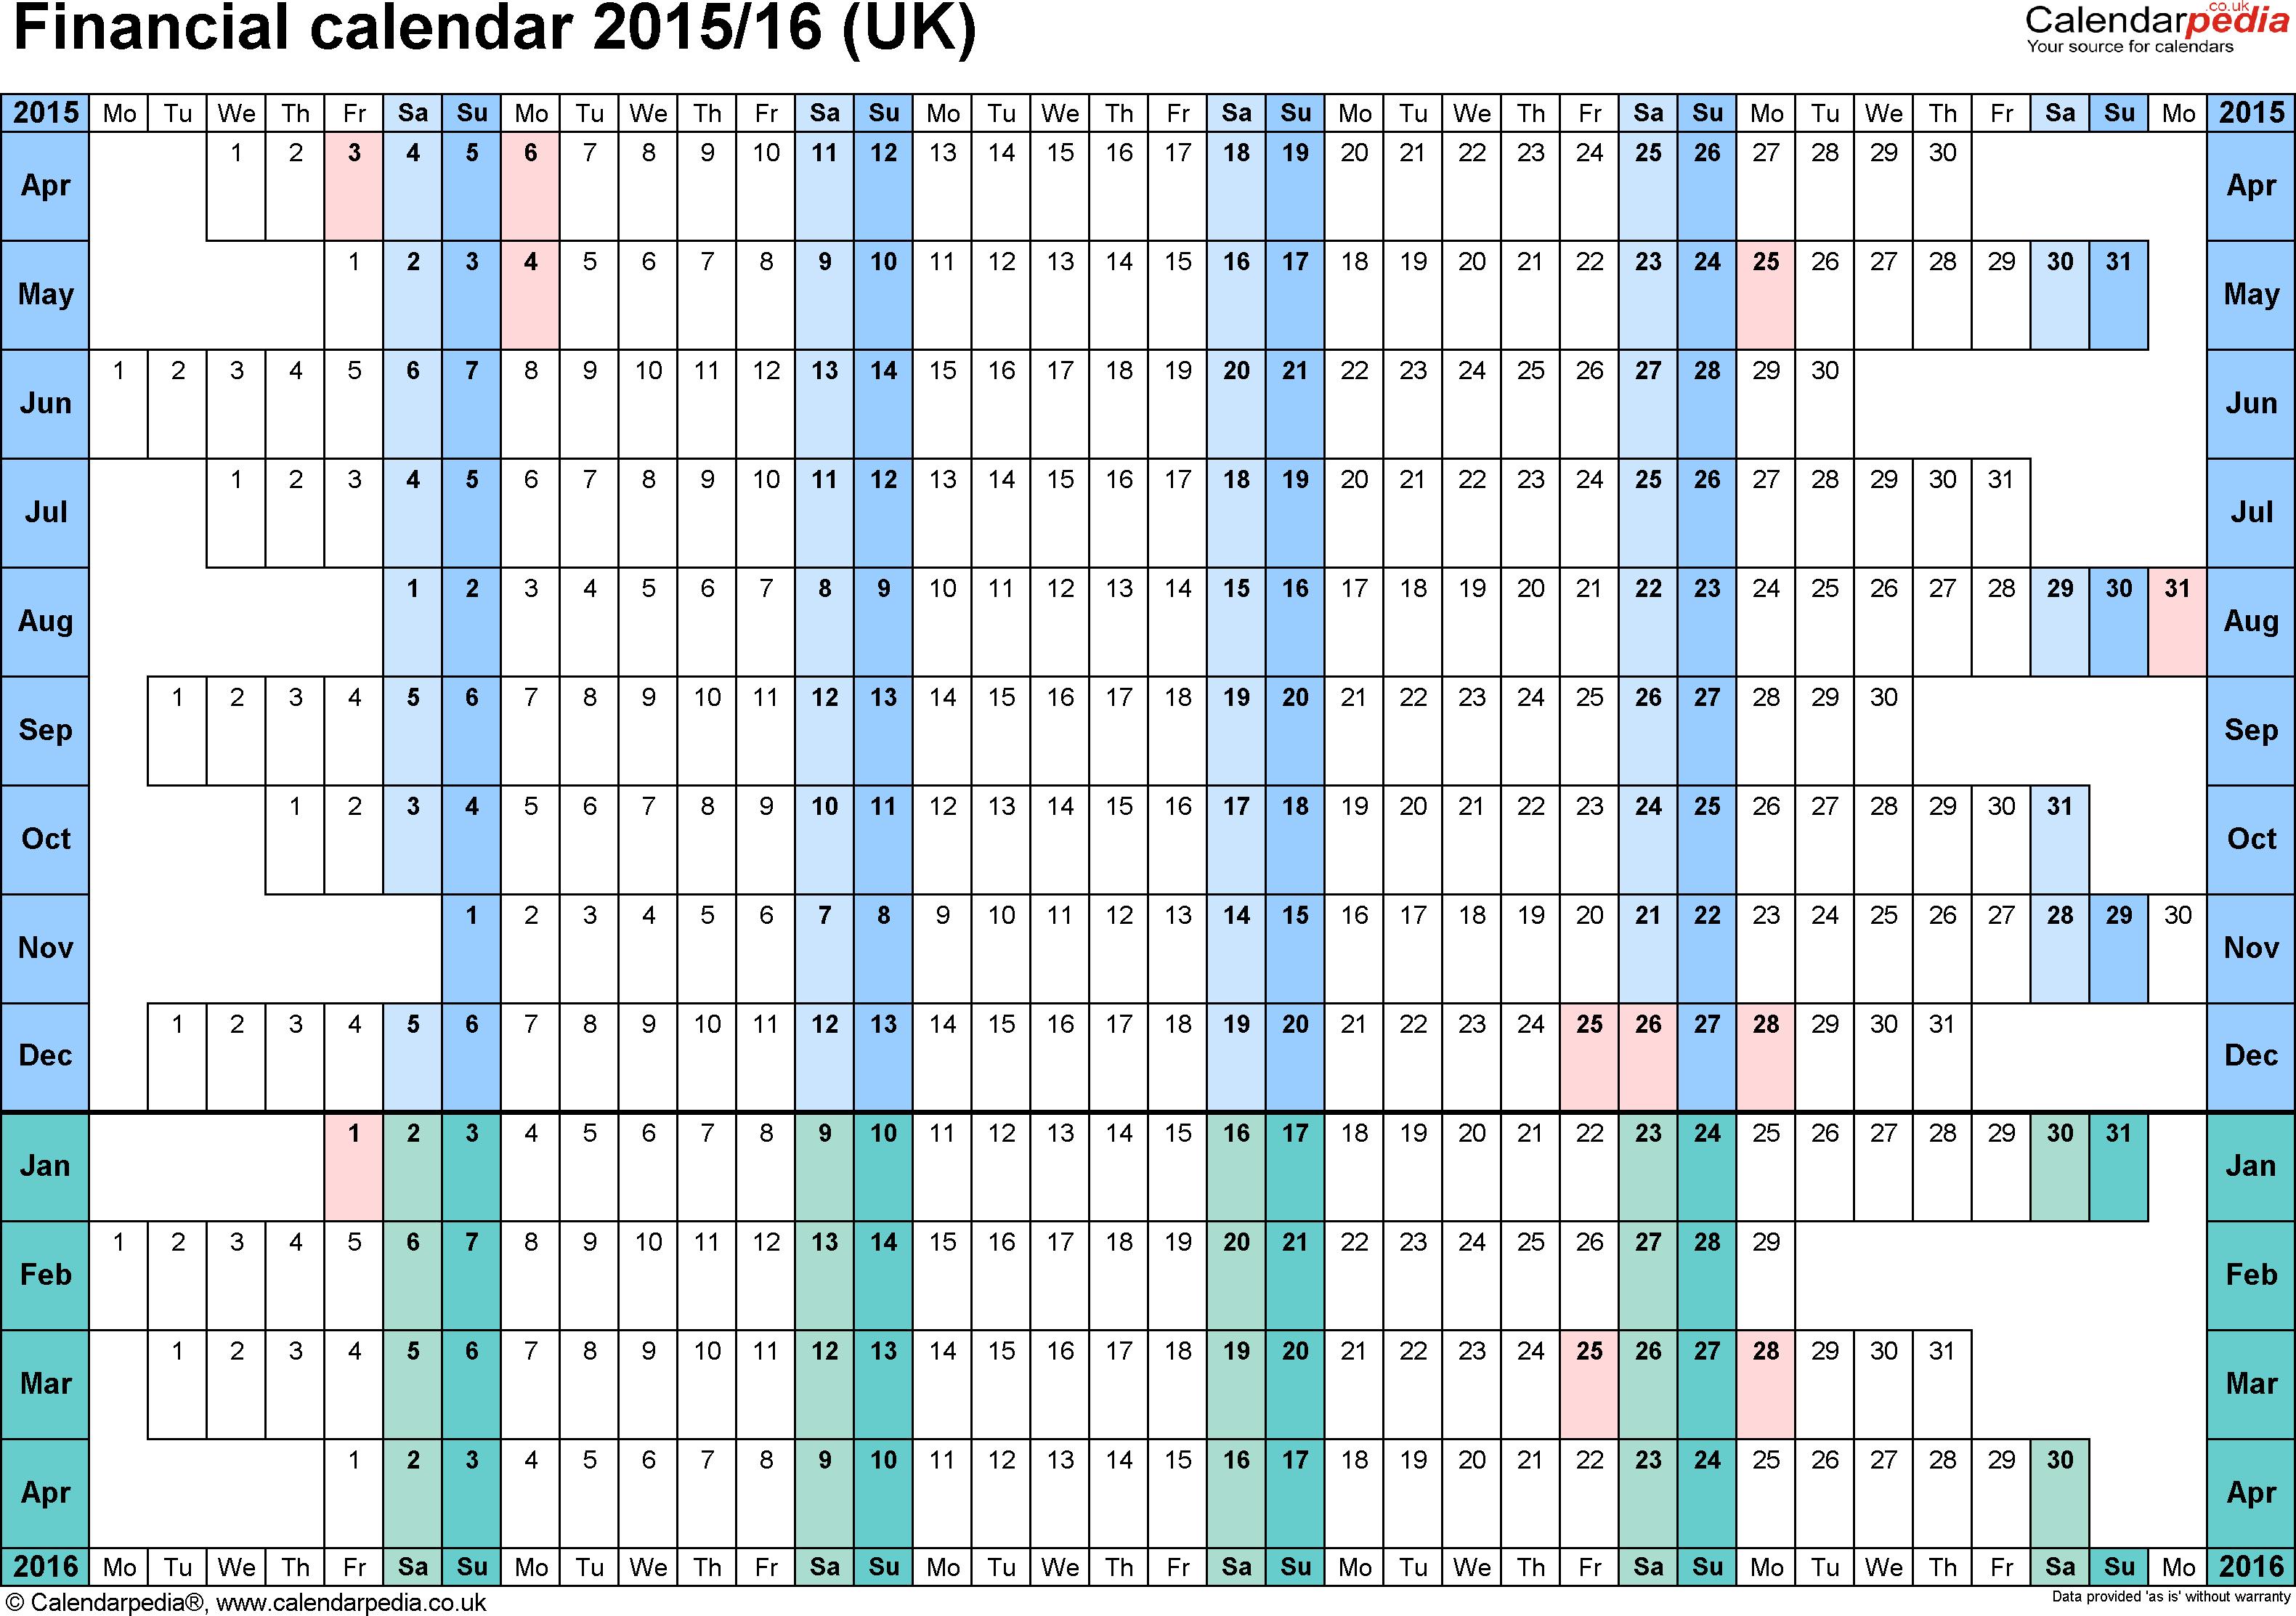 Financial Calendars 2015/16 (Uk) In Pdf Format pertaining to Hmrc Tax Week Calendar 2019 2020